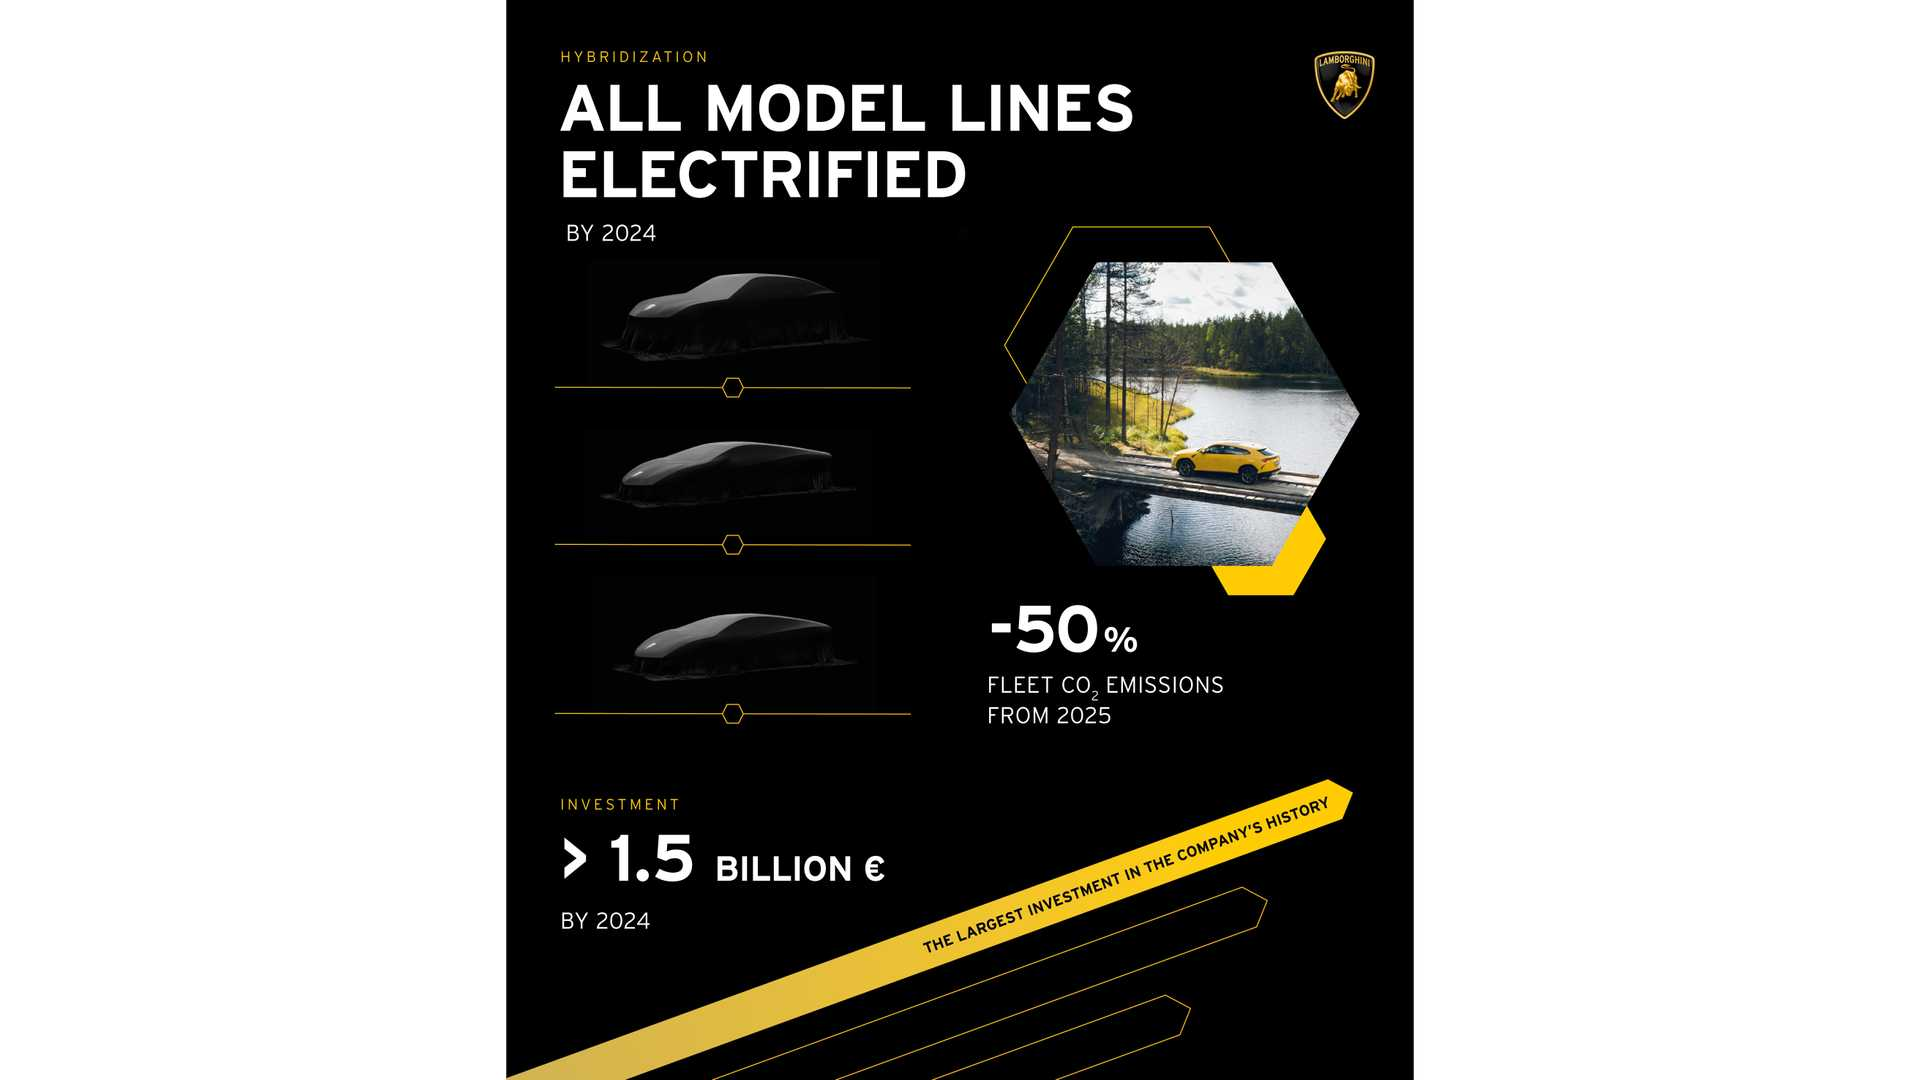 Lamborghini hybrids and EV